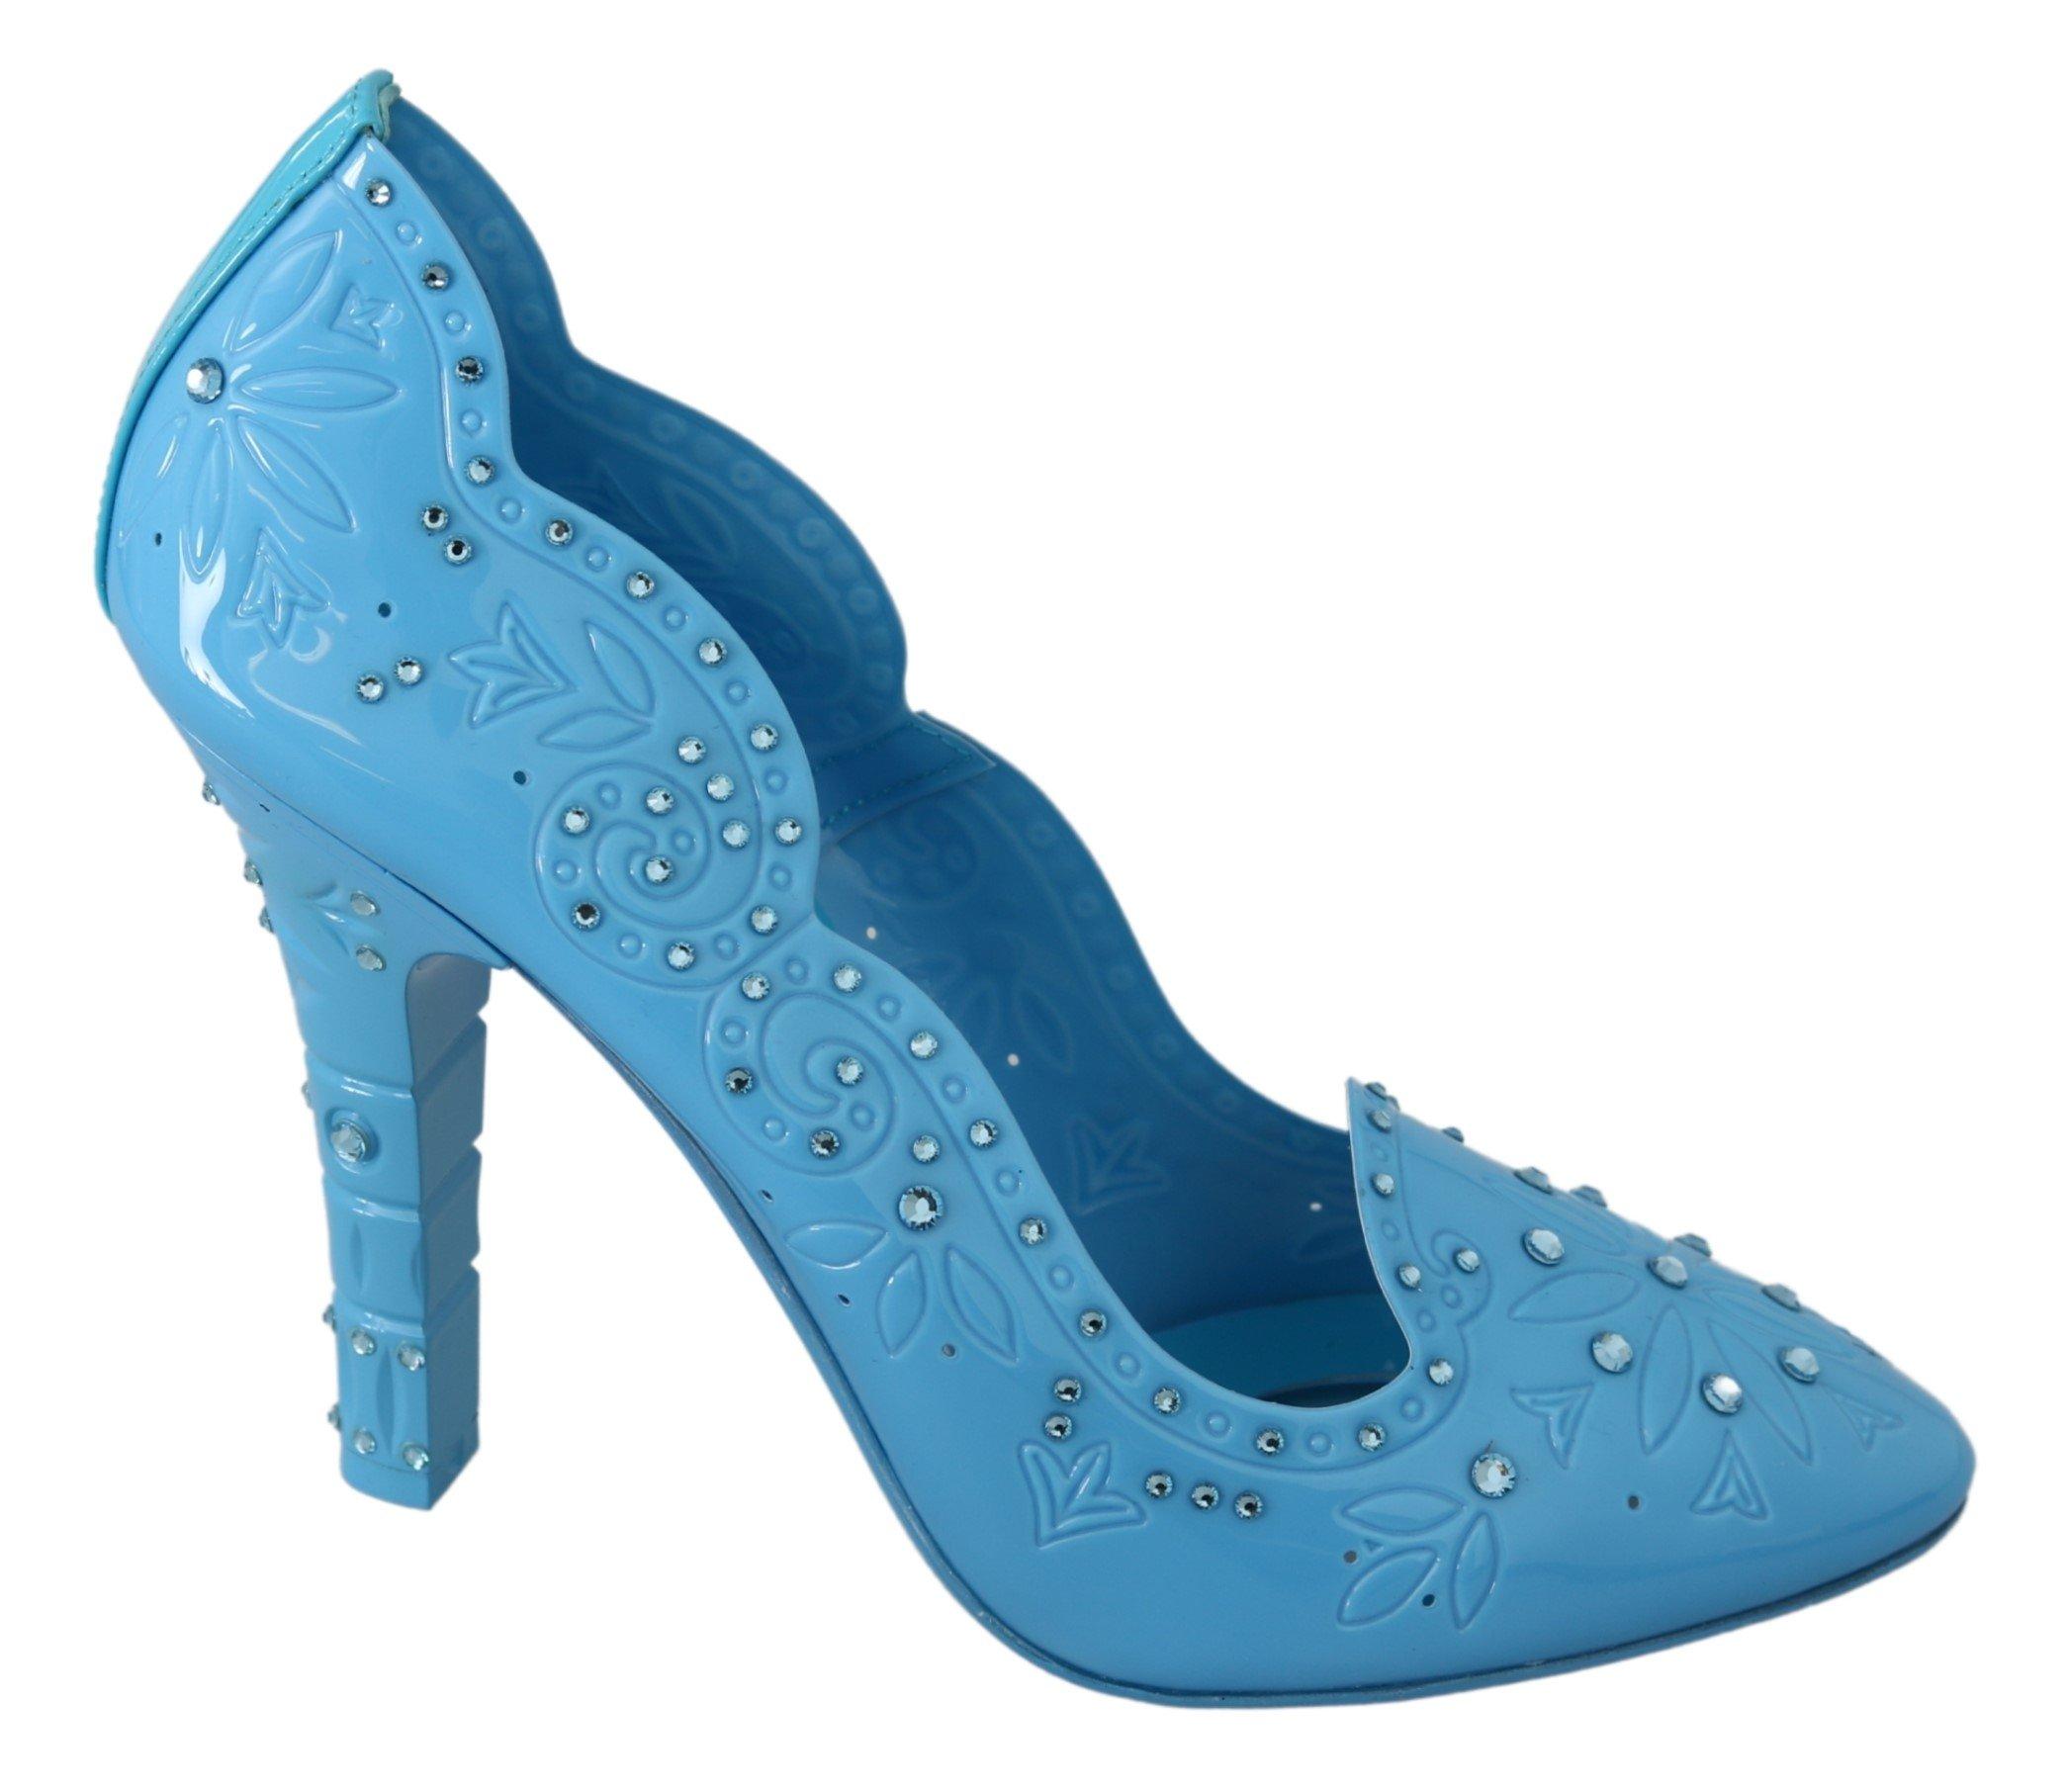 Dolce & Gabbana Women's Crystal Floral CINDERELLA Pumps Blue LA7270 - EU39/US8.5